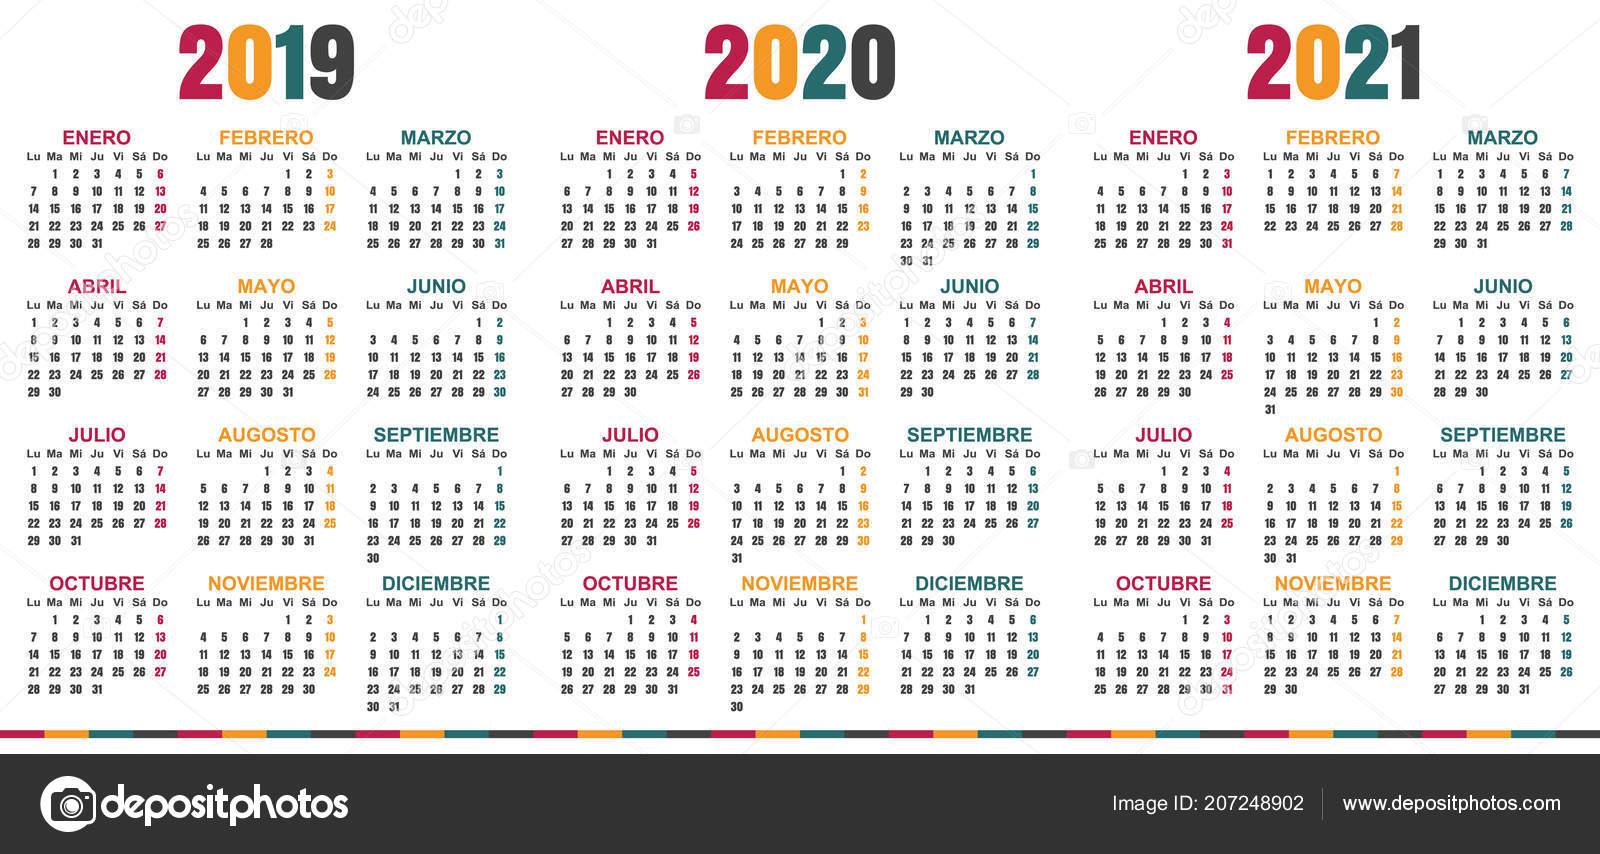 Calendario 2019 2020.Spanish Planning Calendar 2019 2021 Week Starts Monday Simple